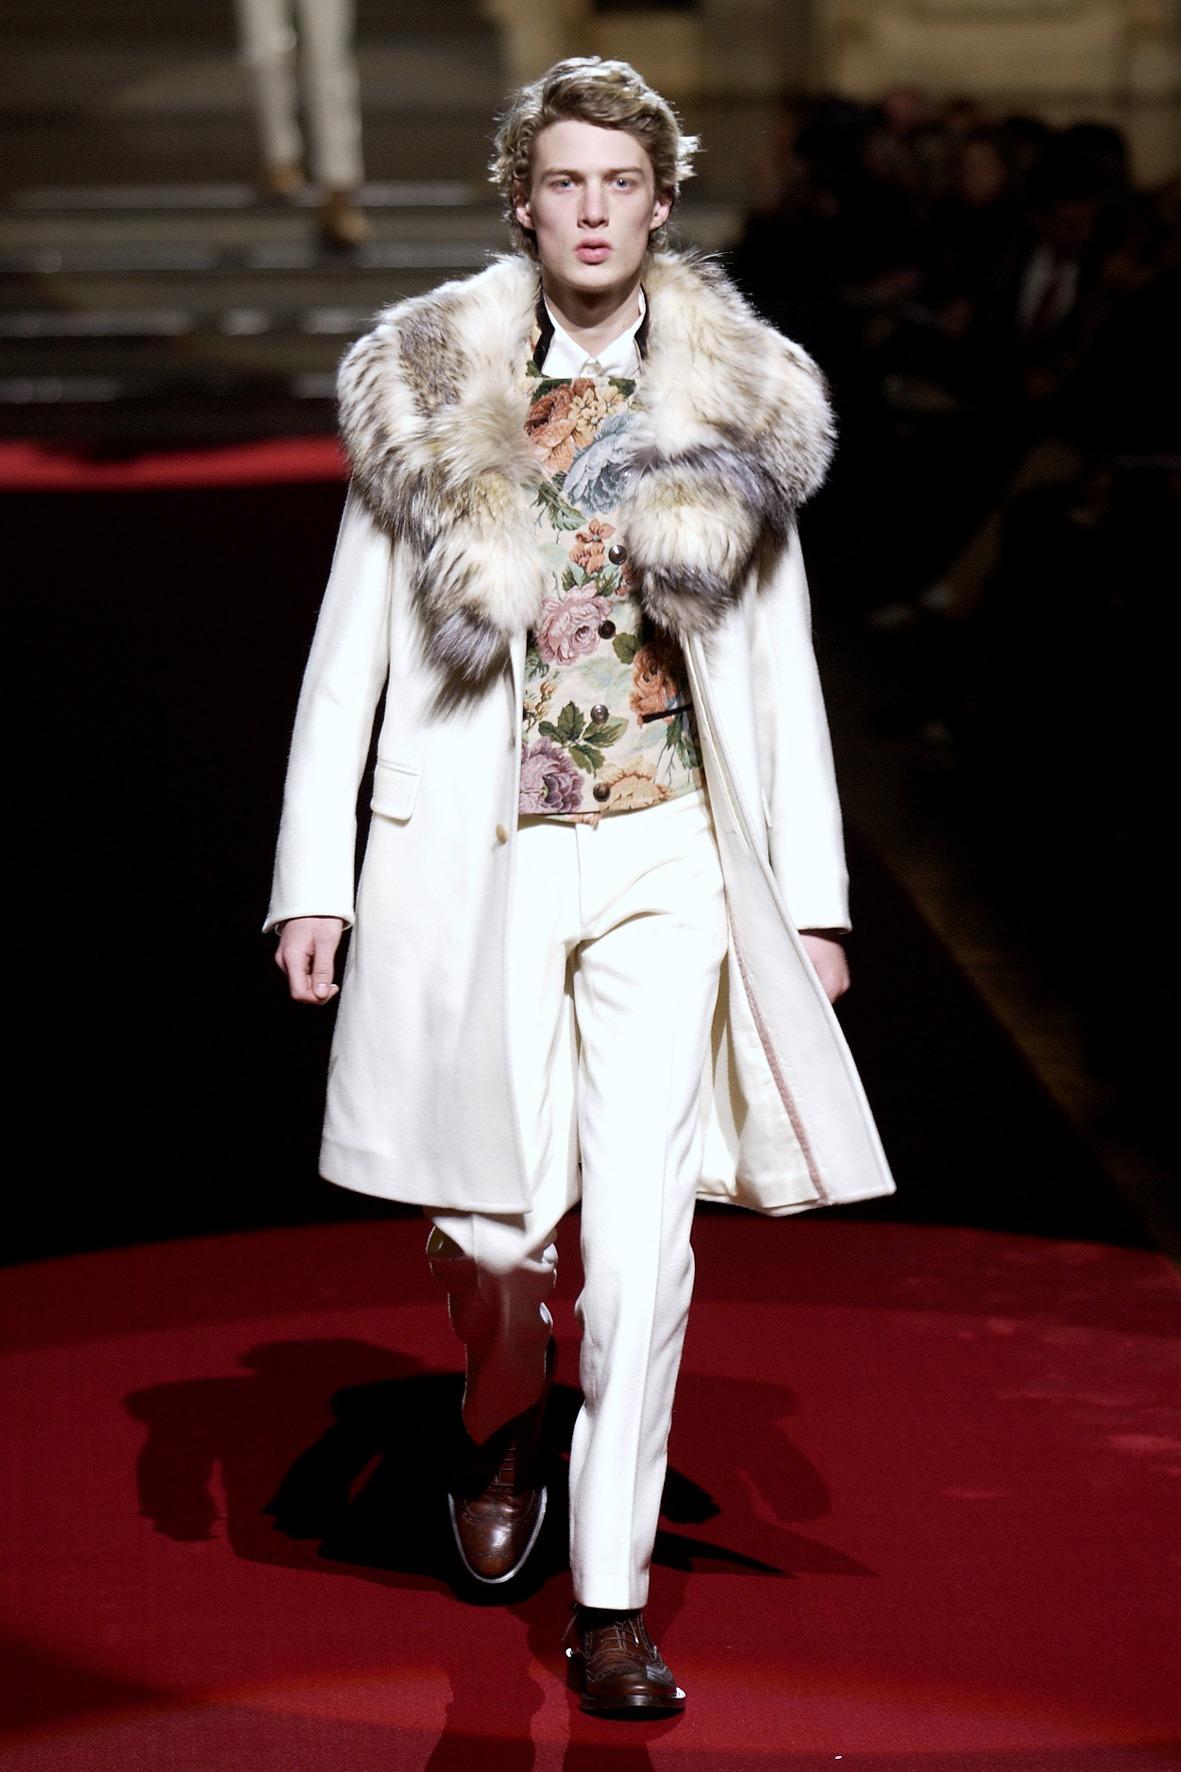 Roberto Cavalli 2002 Fall/Winter Menswear